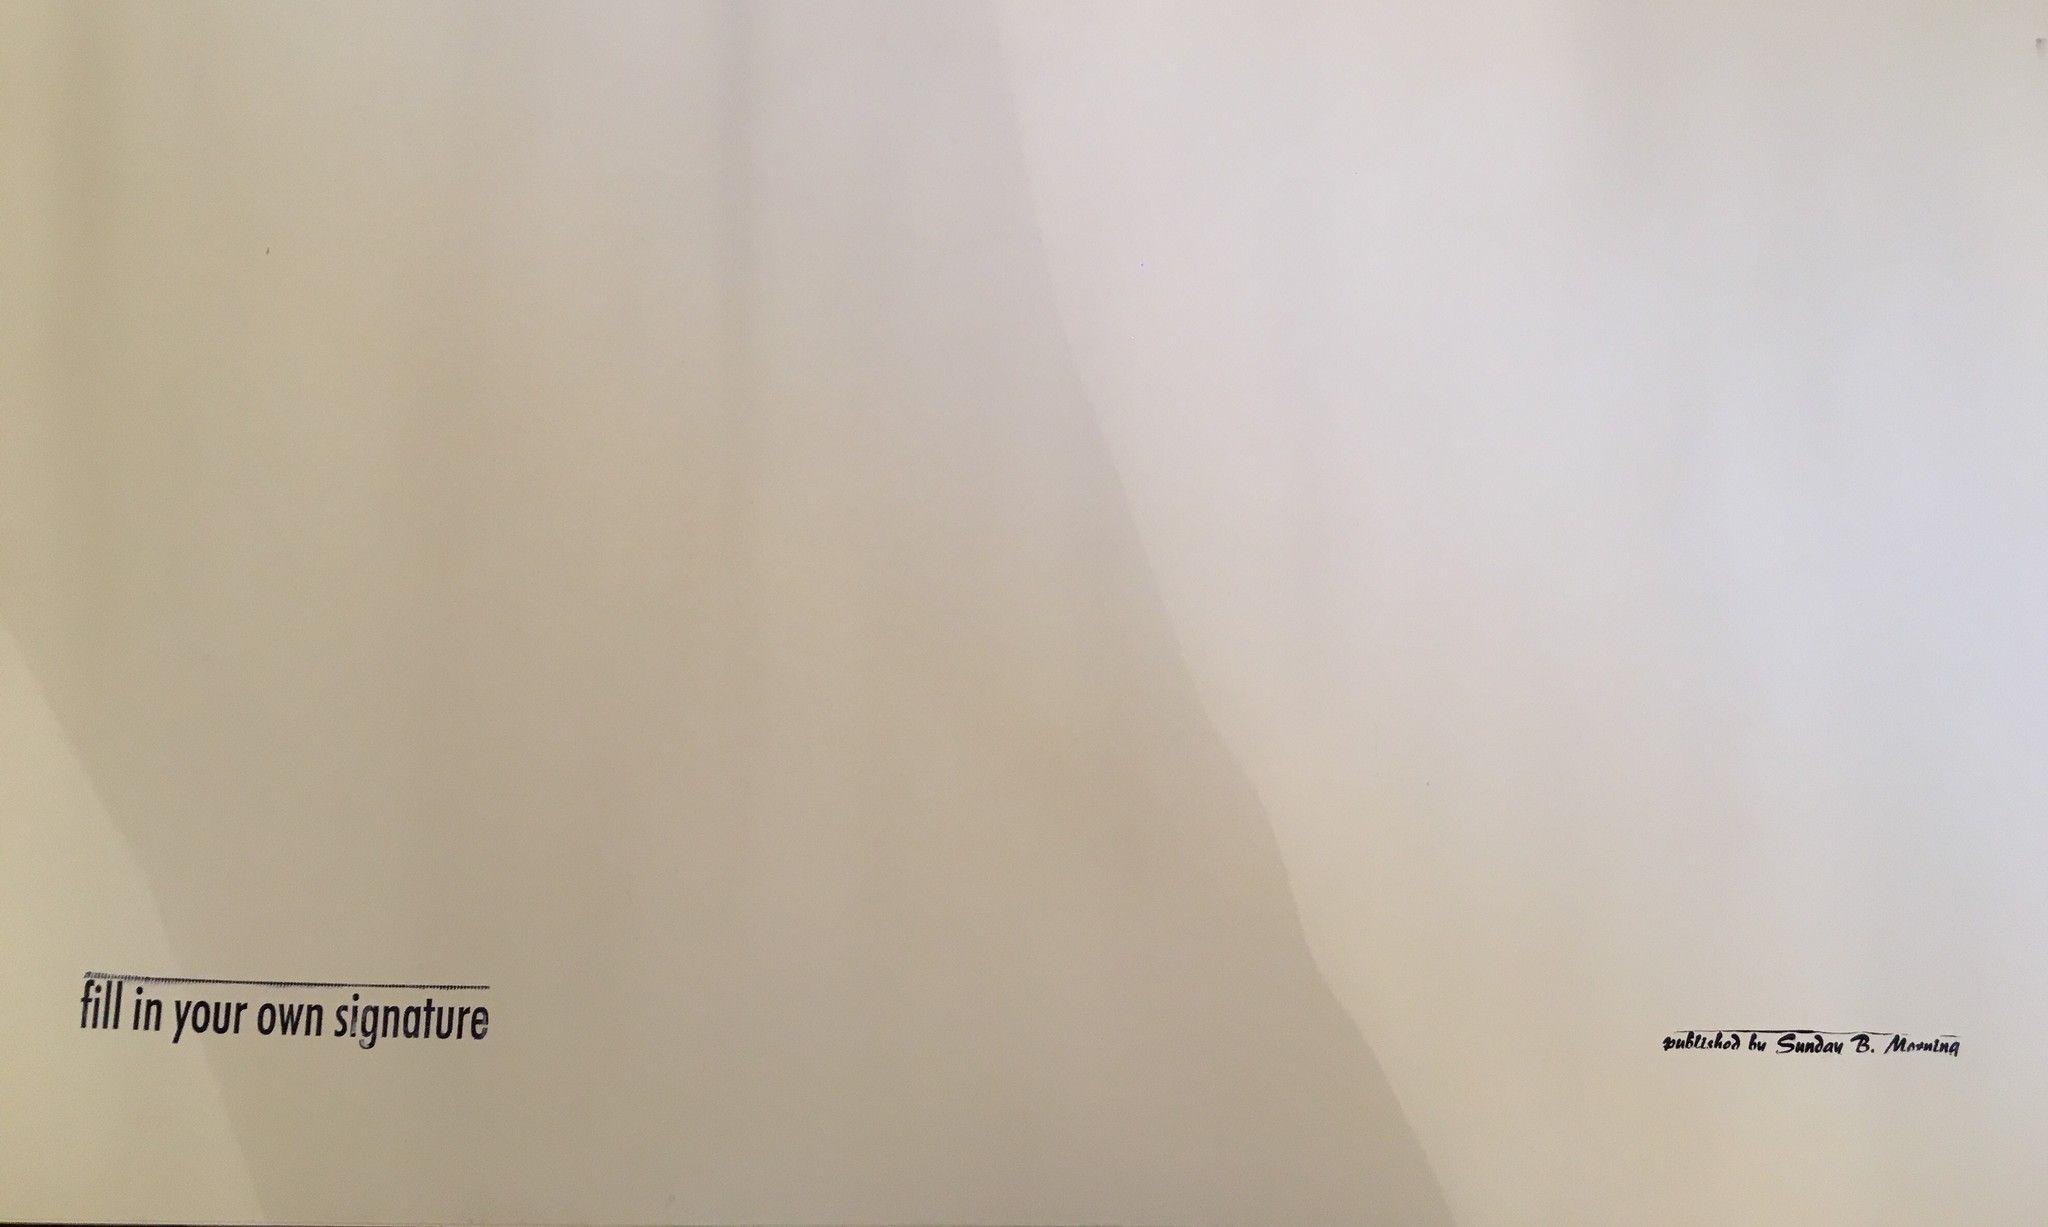 SERIGRAFIA ANDY WARHOL ' MARILYN 4 '  dimensioni L 91,5 x H 91,5 cm.